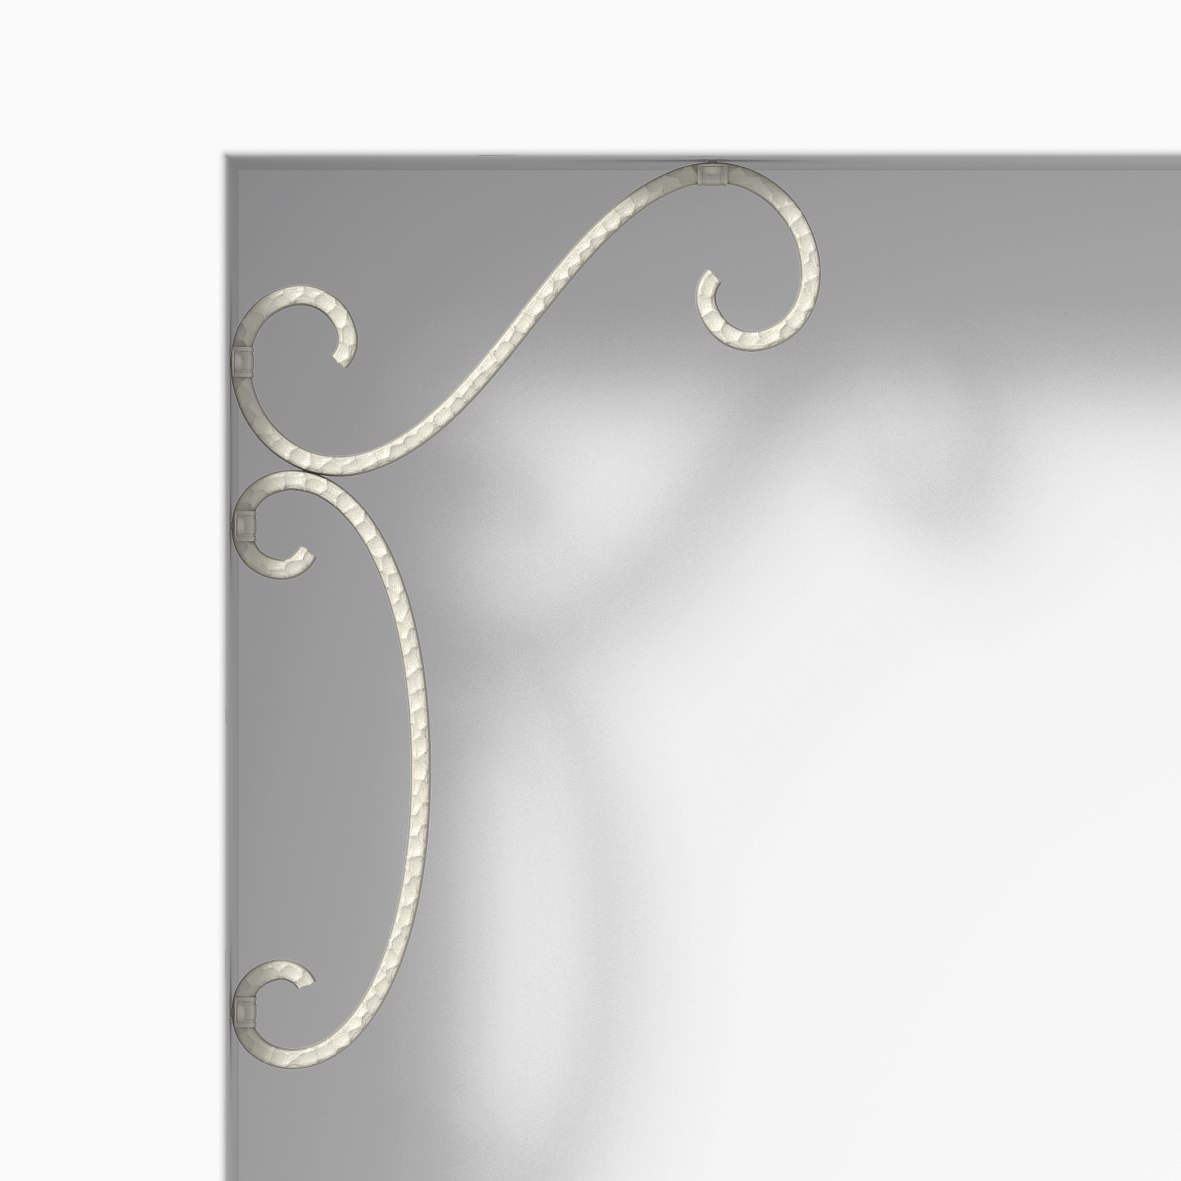 YKKap ポーチ壁飾り EE2型 シャローネ エレガント 壁飾り  ウオールエクステリア